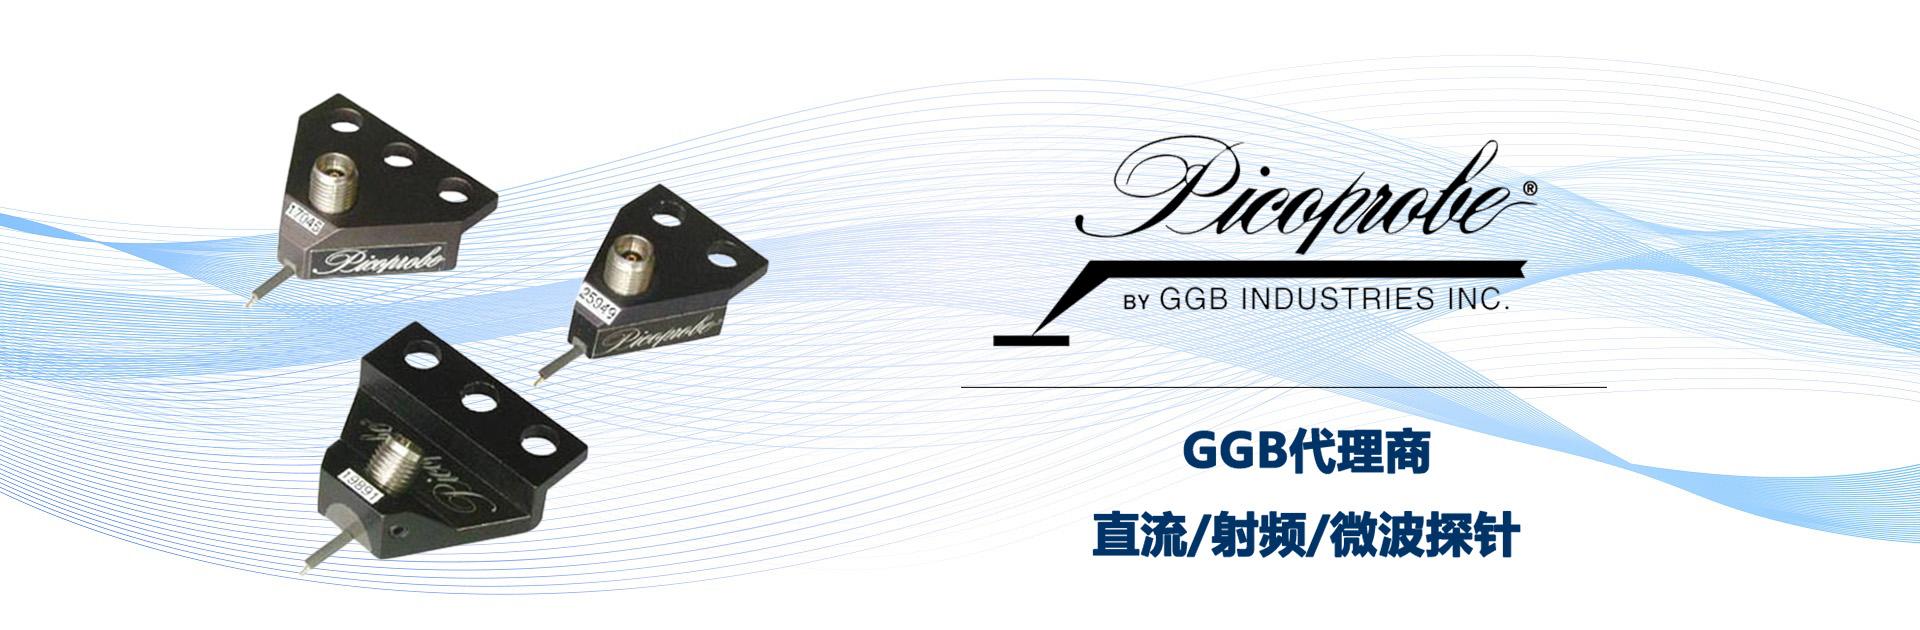 GGB射频火狐体育app安卓版